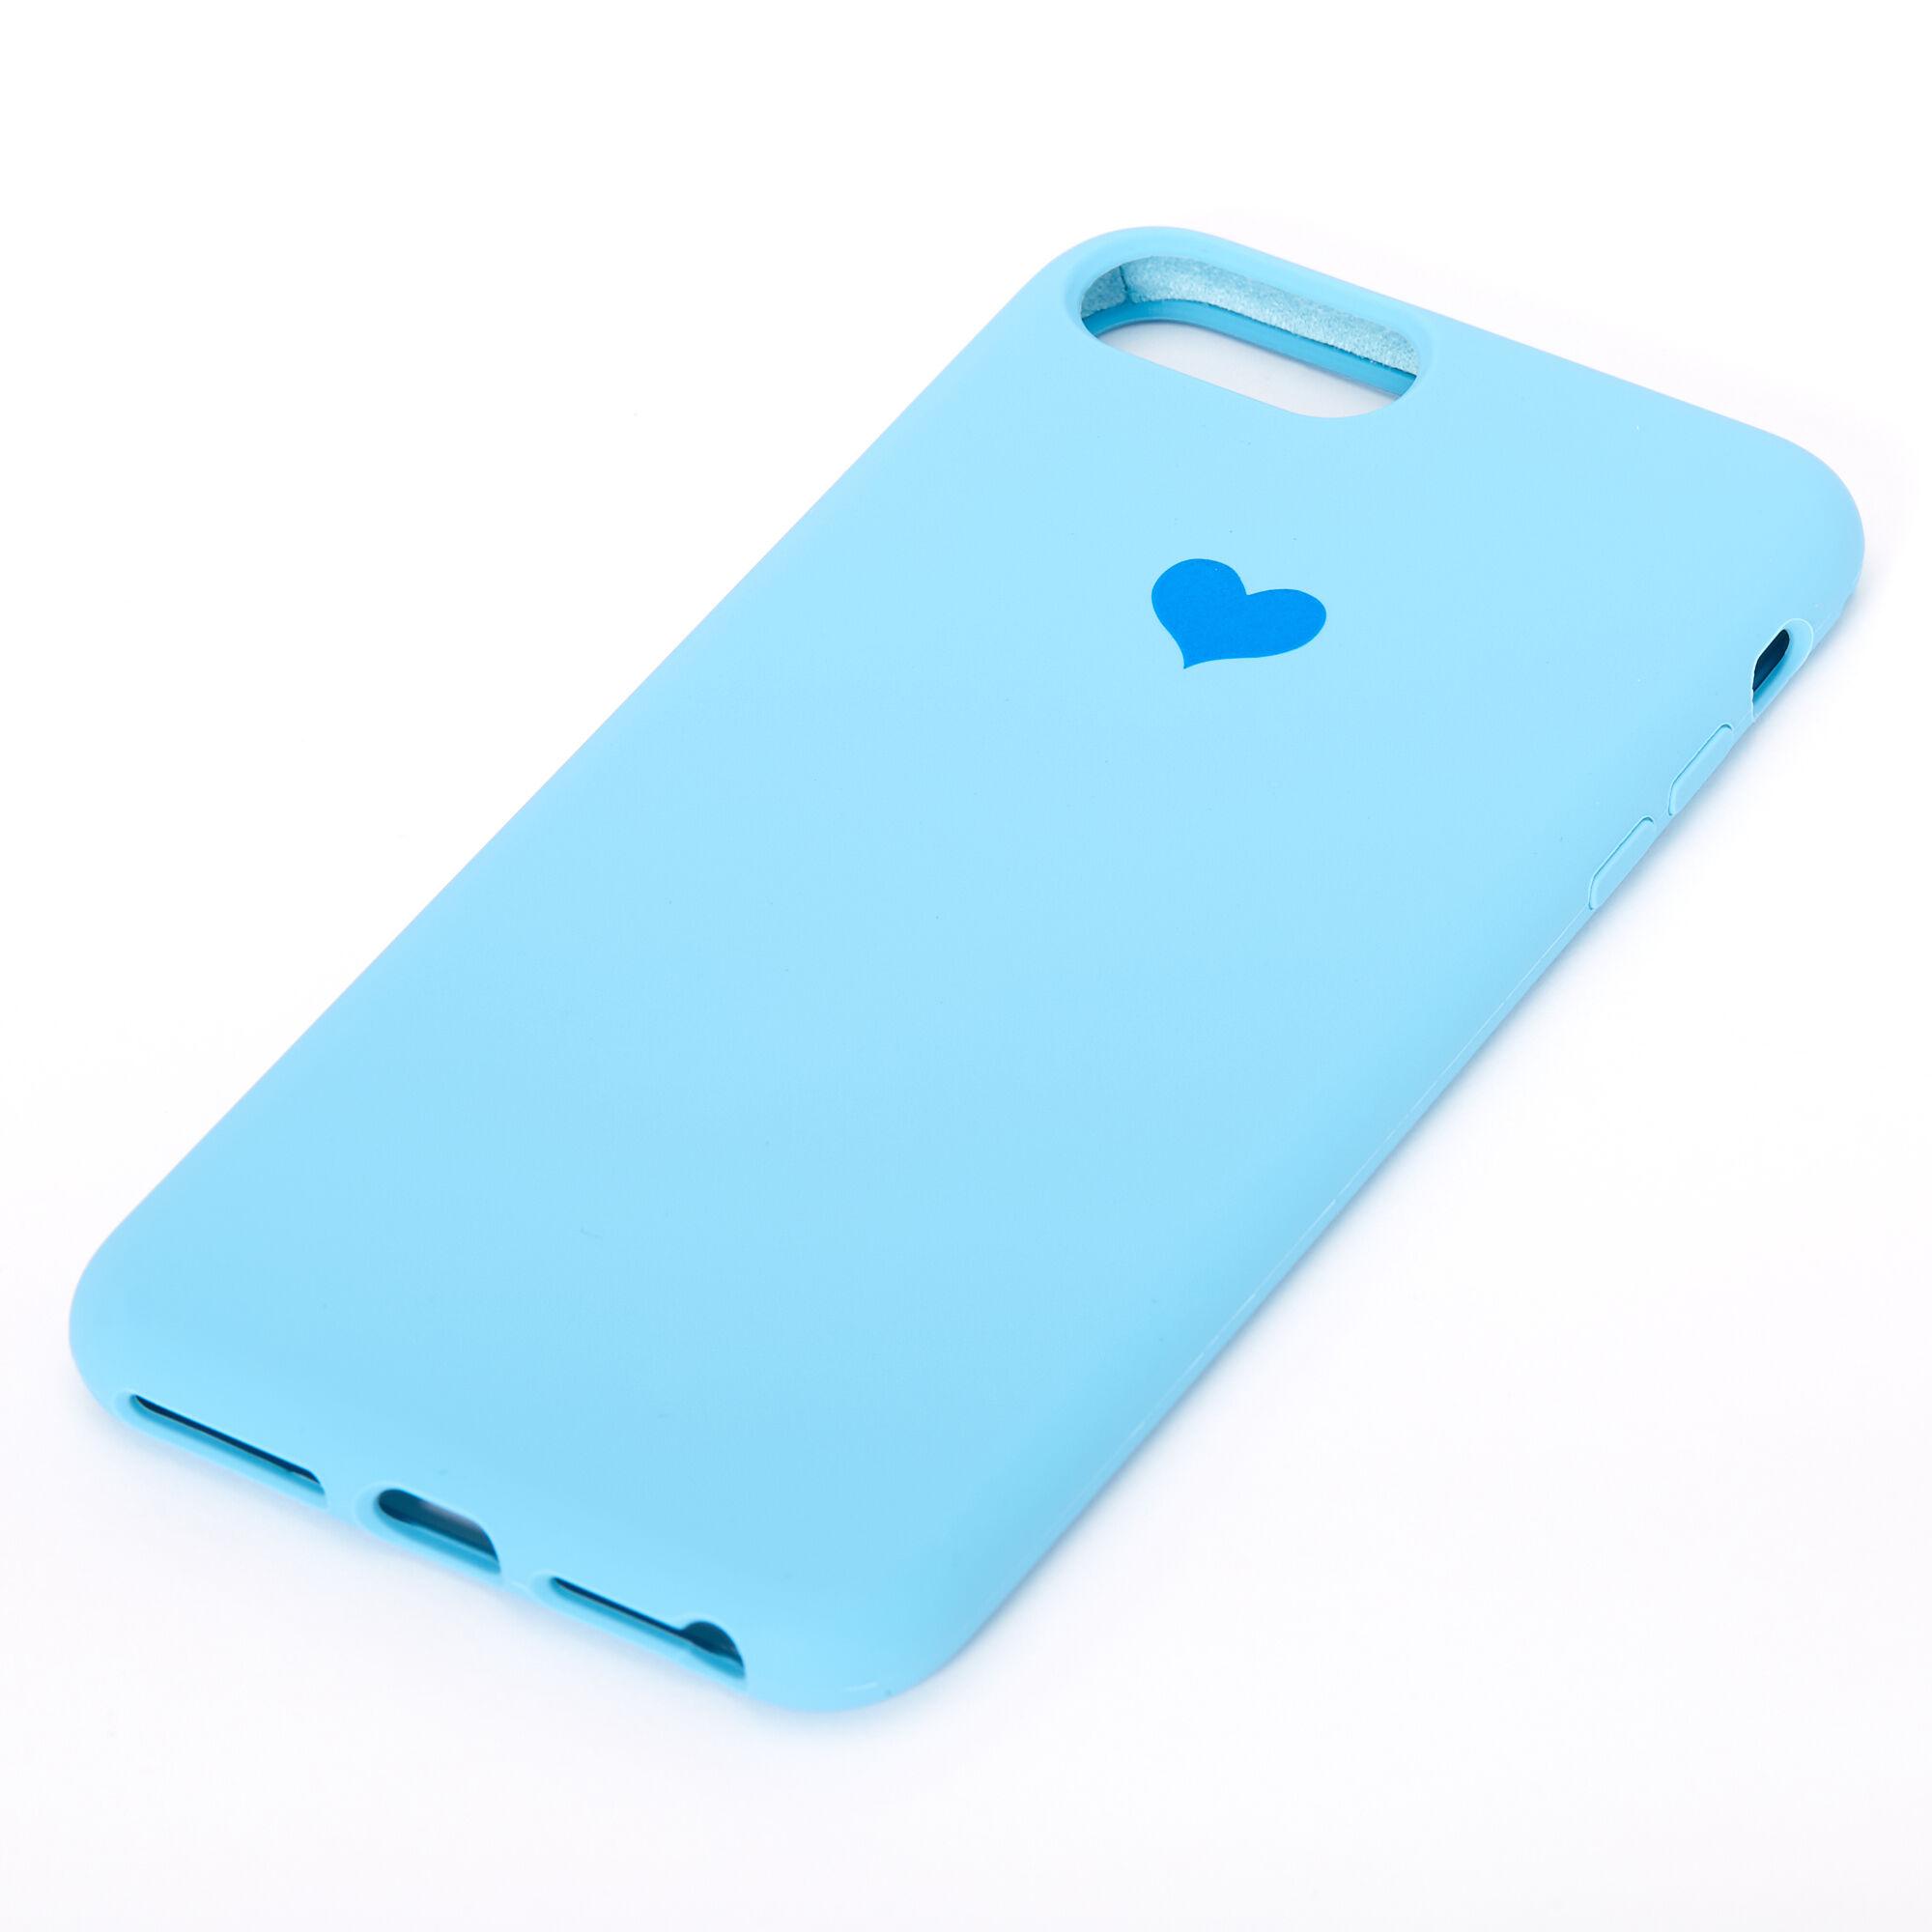 Cobalt Heart Phone Case - Fits iPhone 6/7/8 Plus